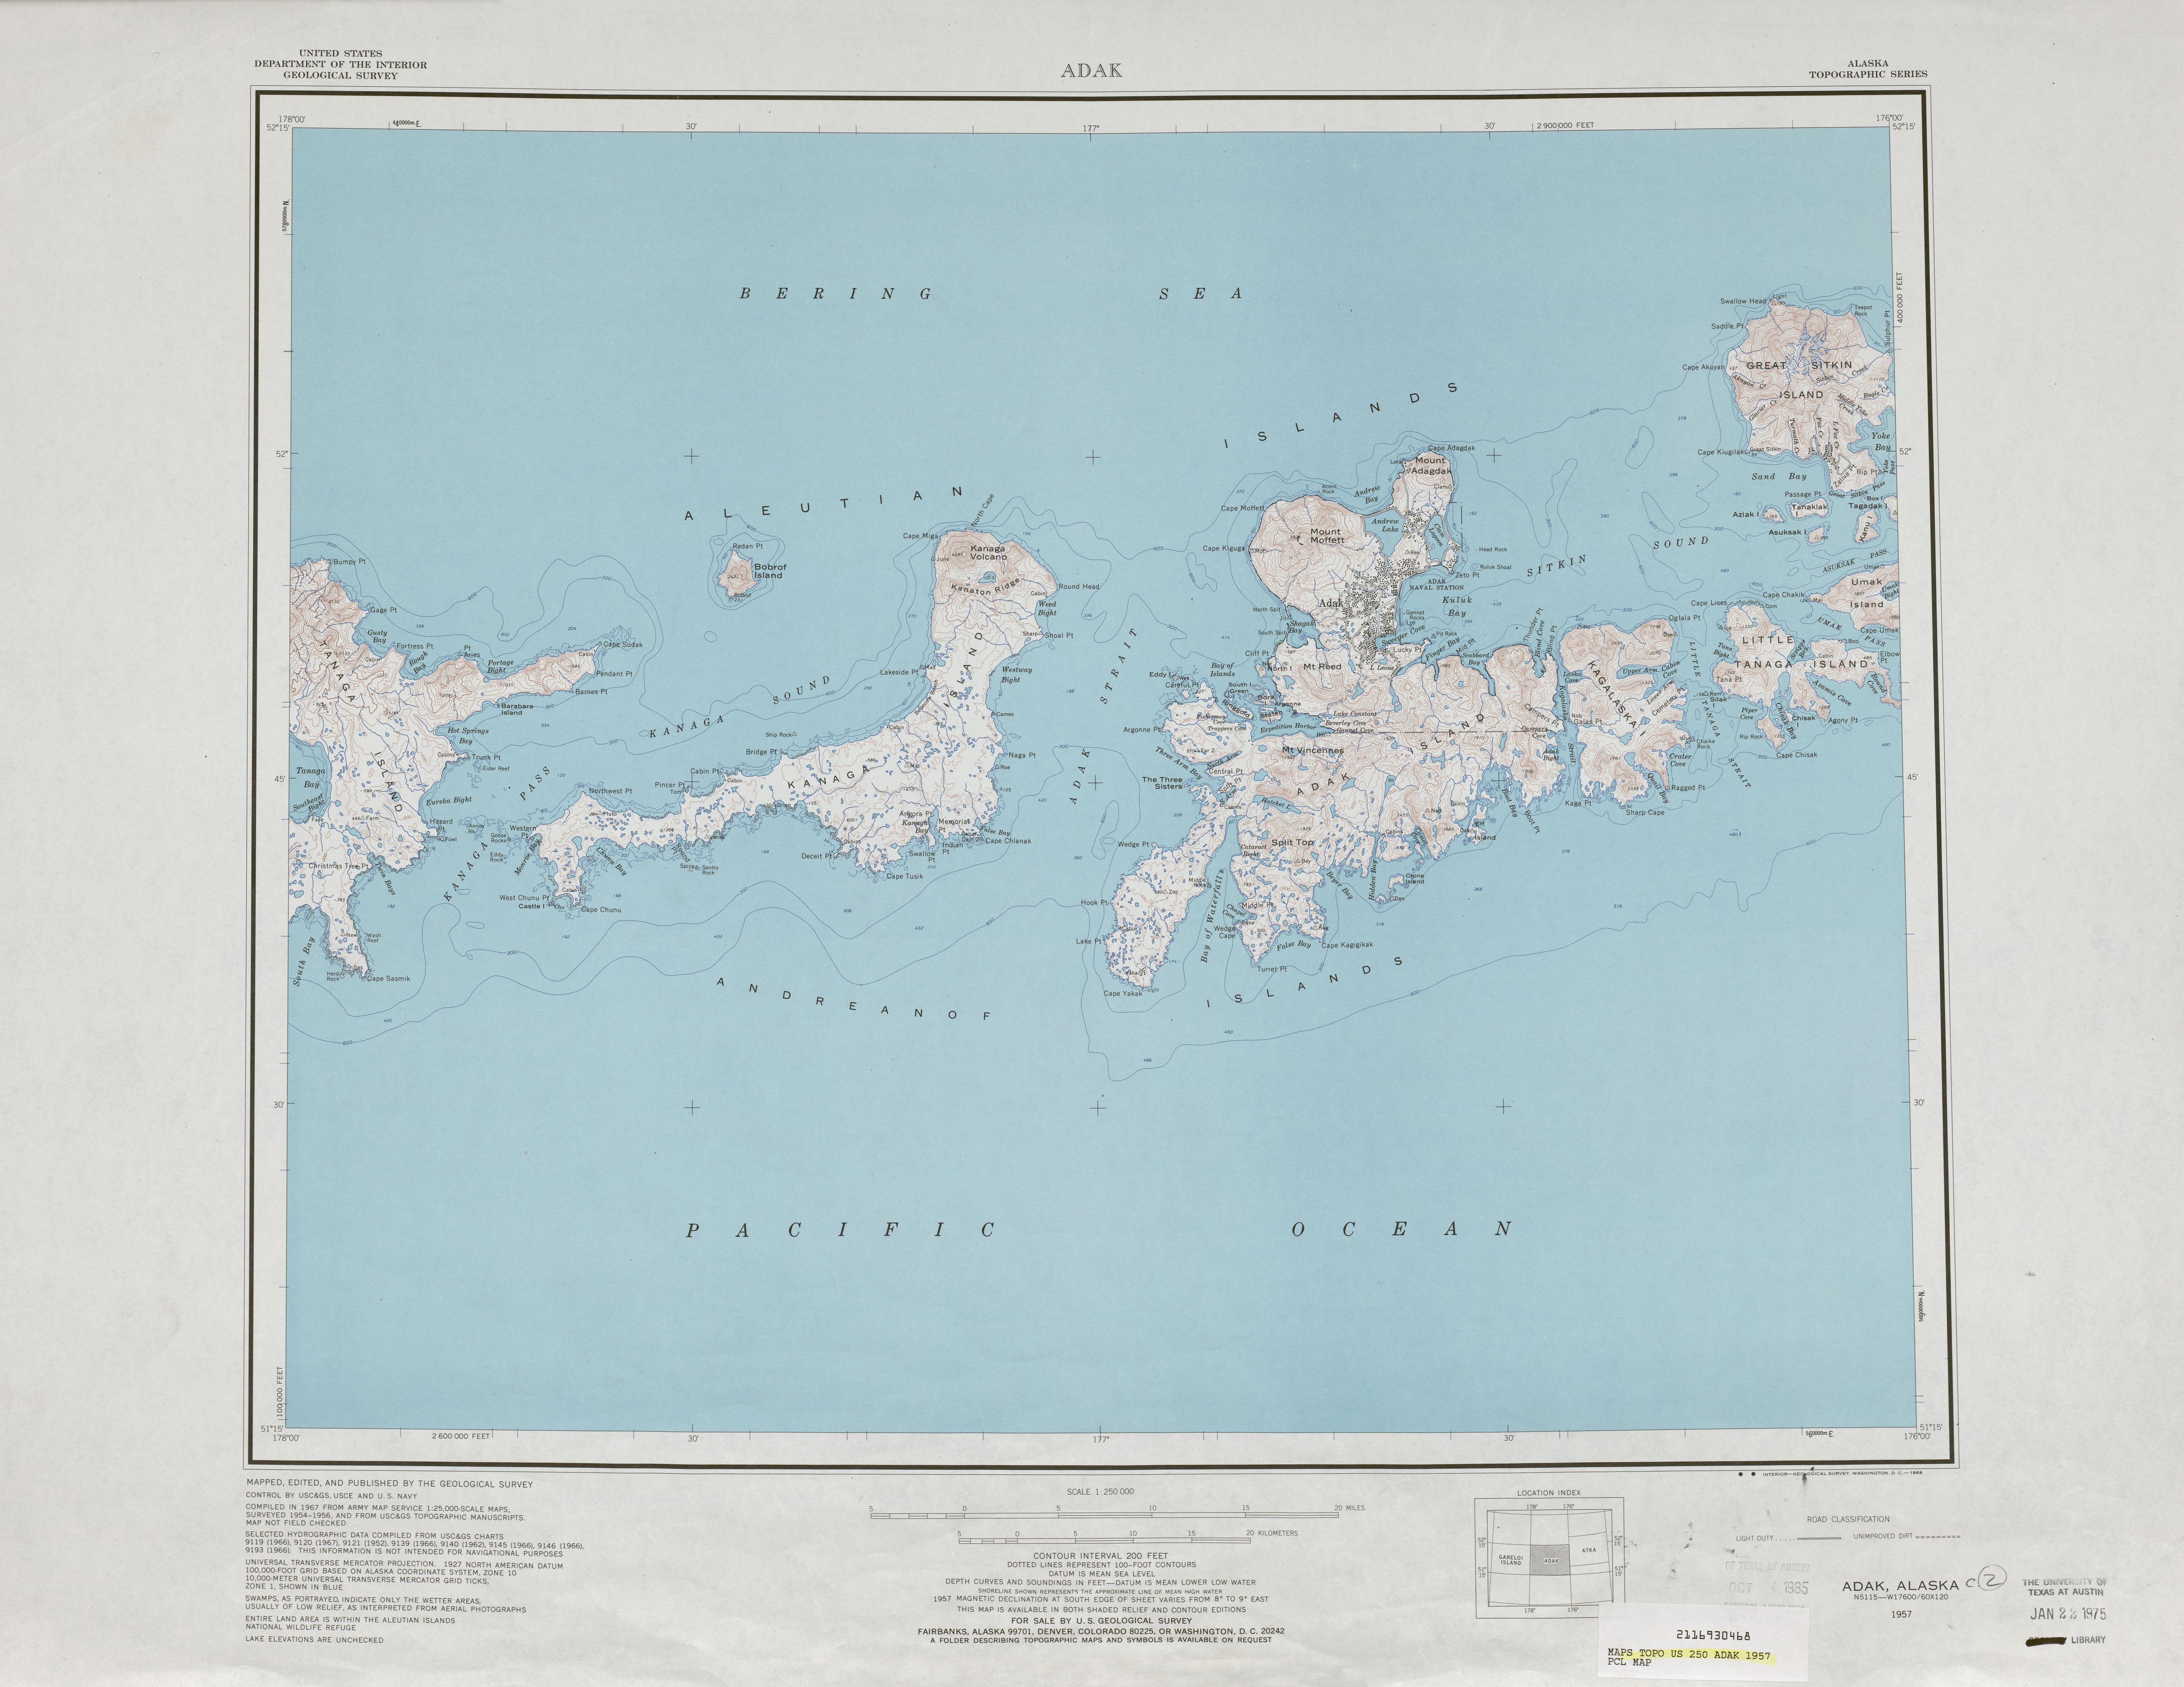 Adak Topographic Map Sheet, United States 1957